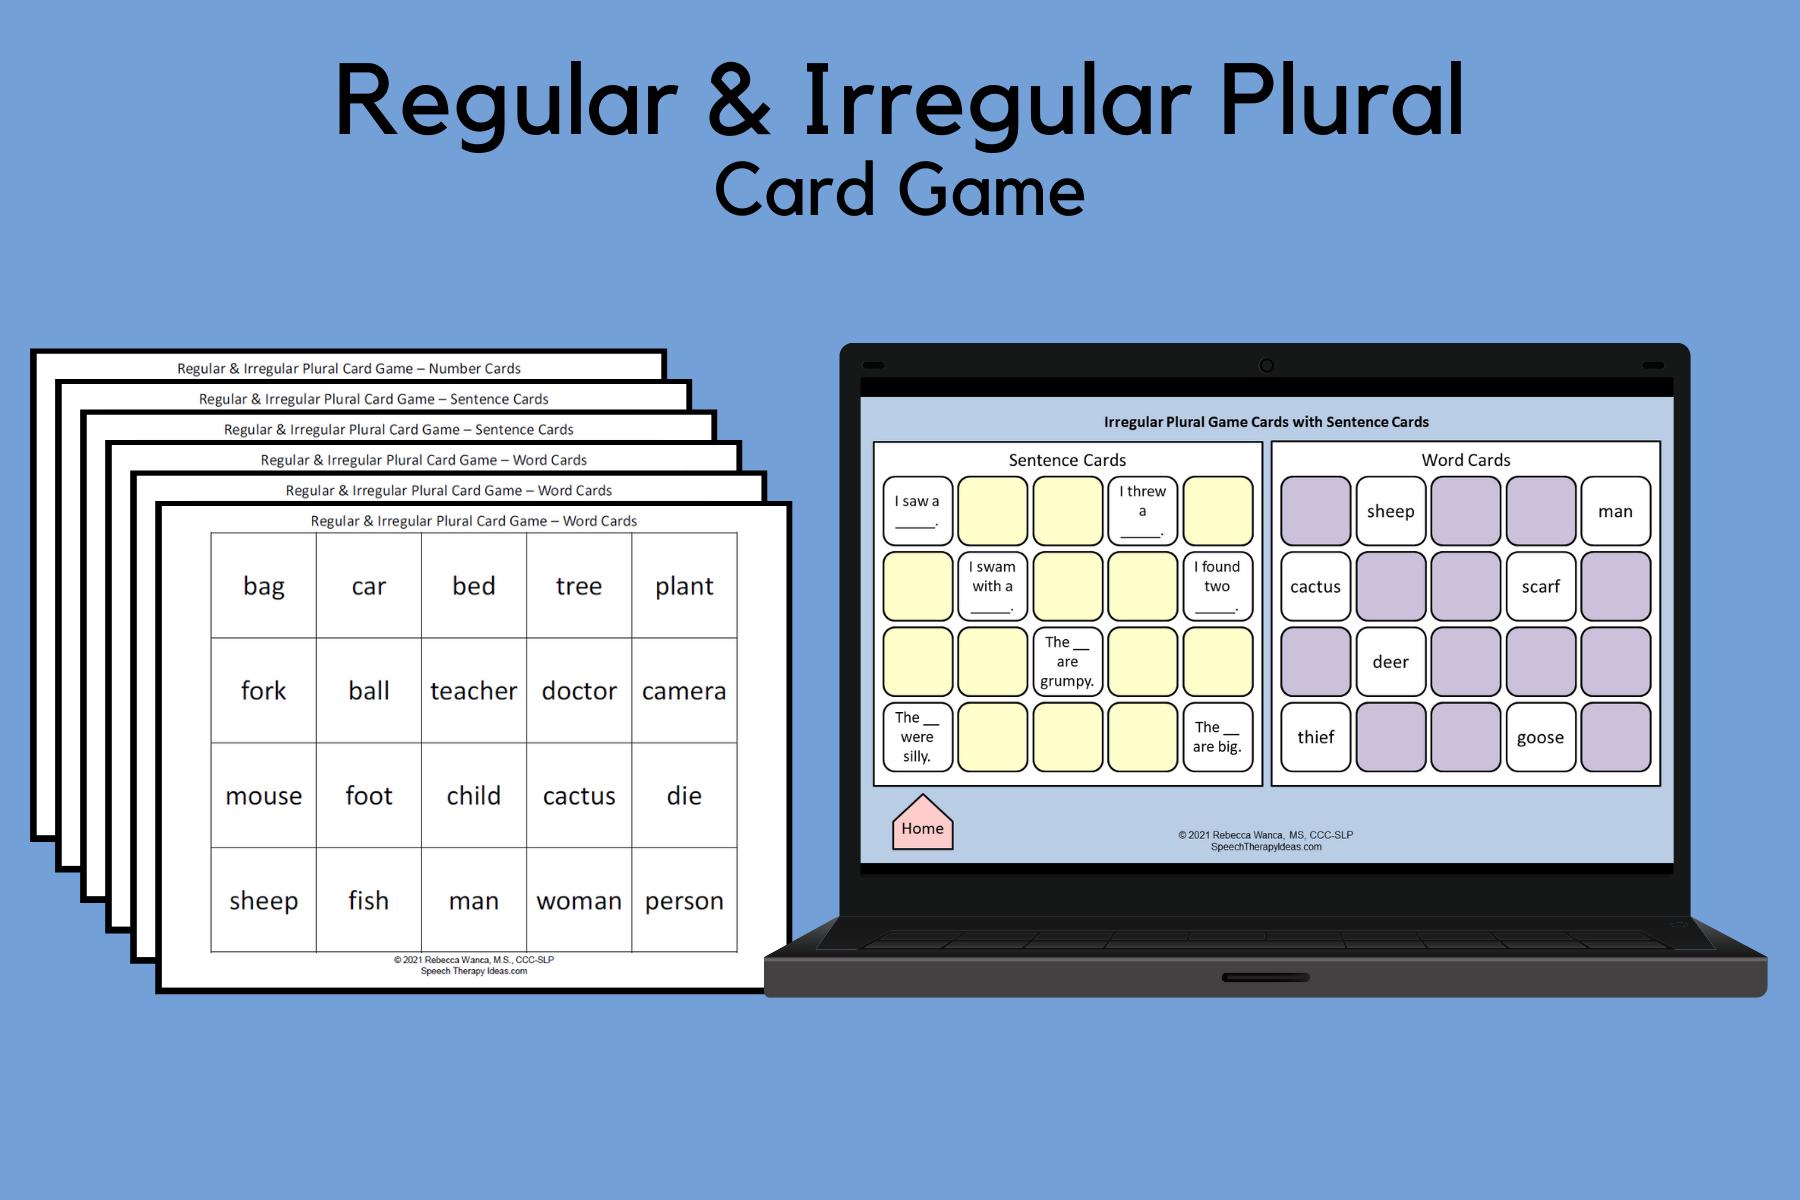 Regular and Irregular Plural Card Game